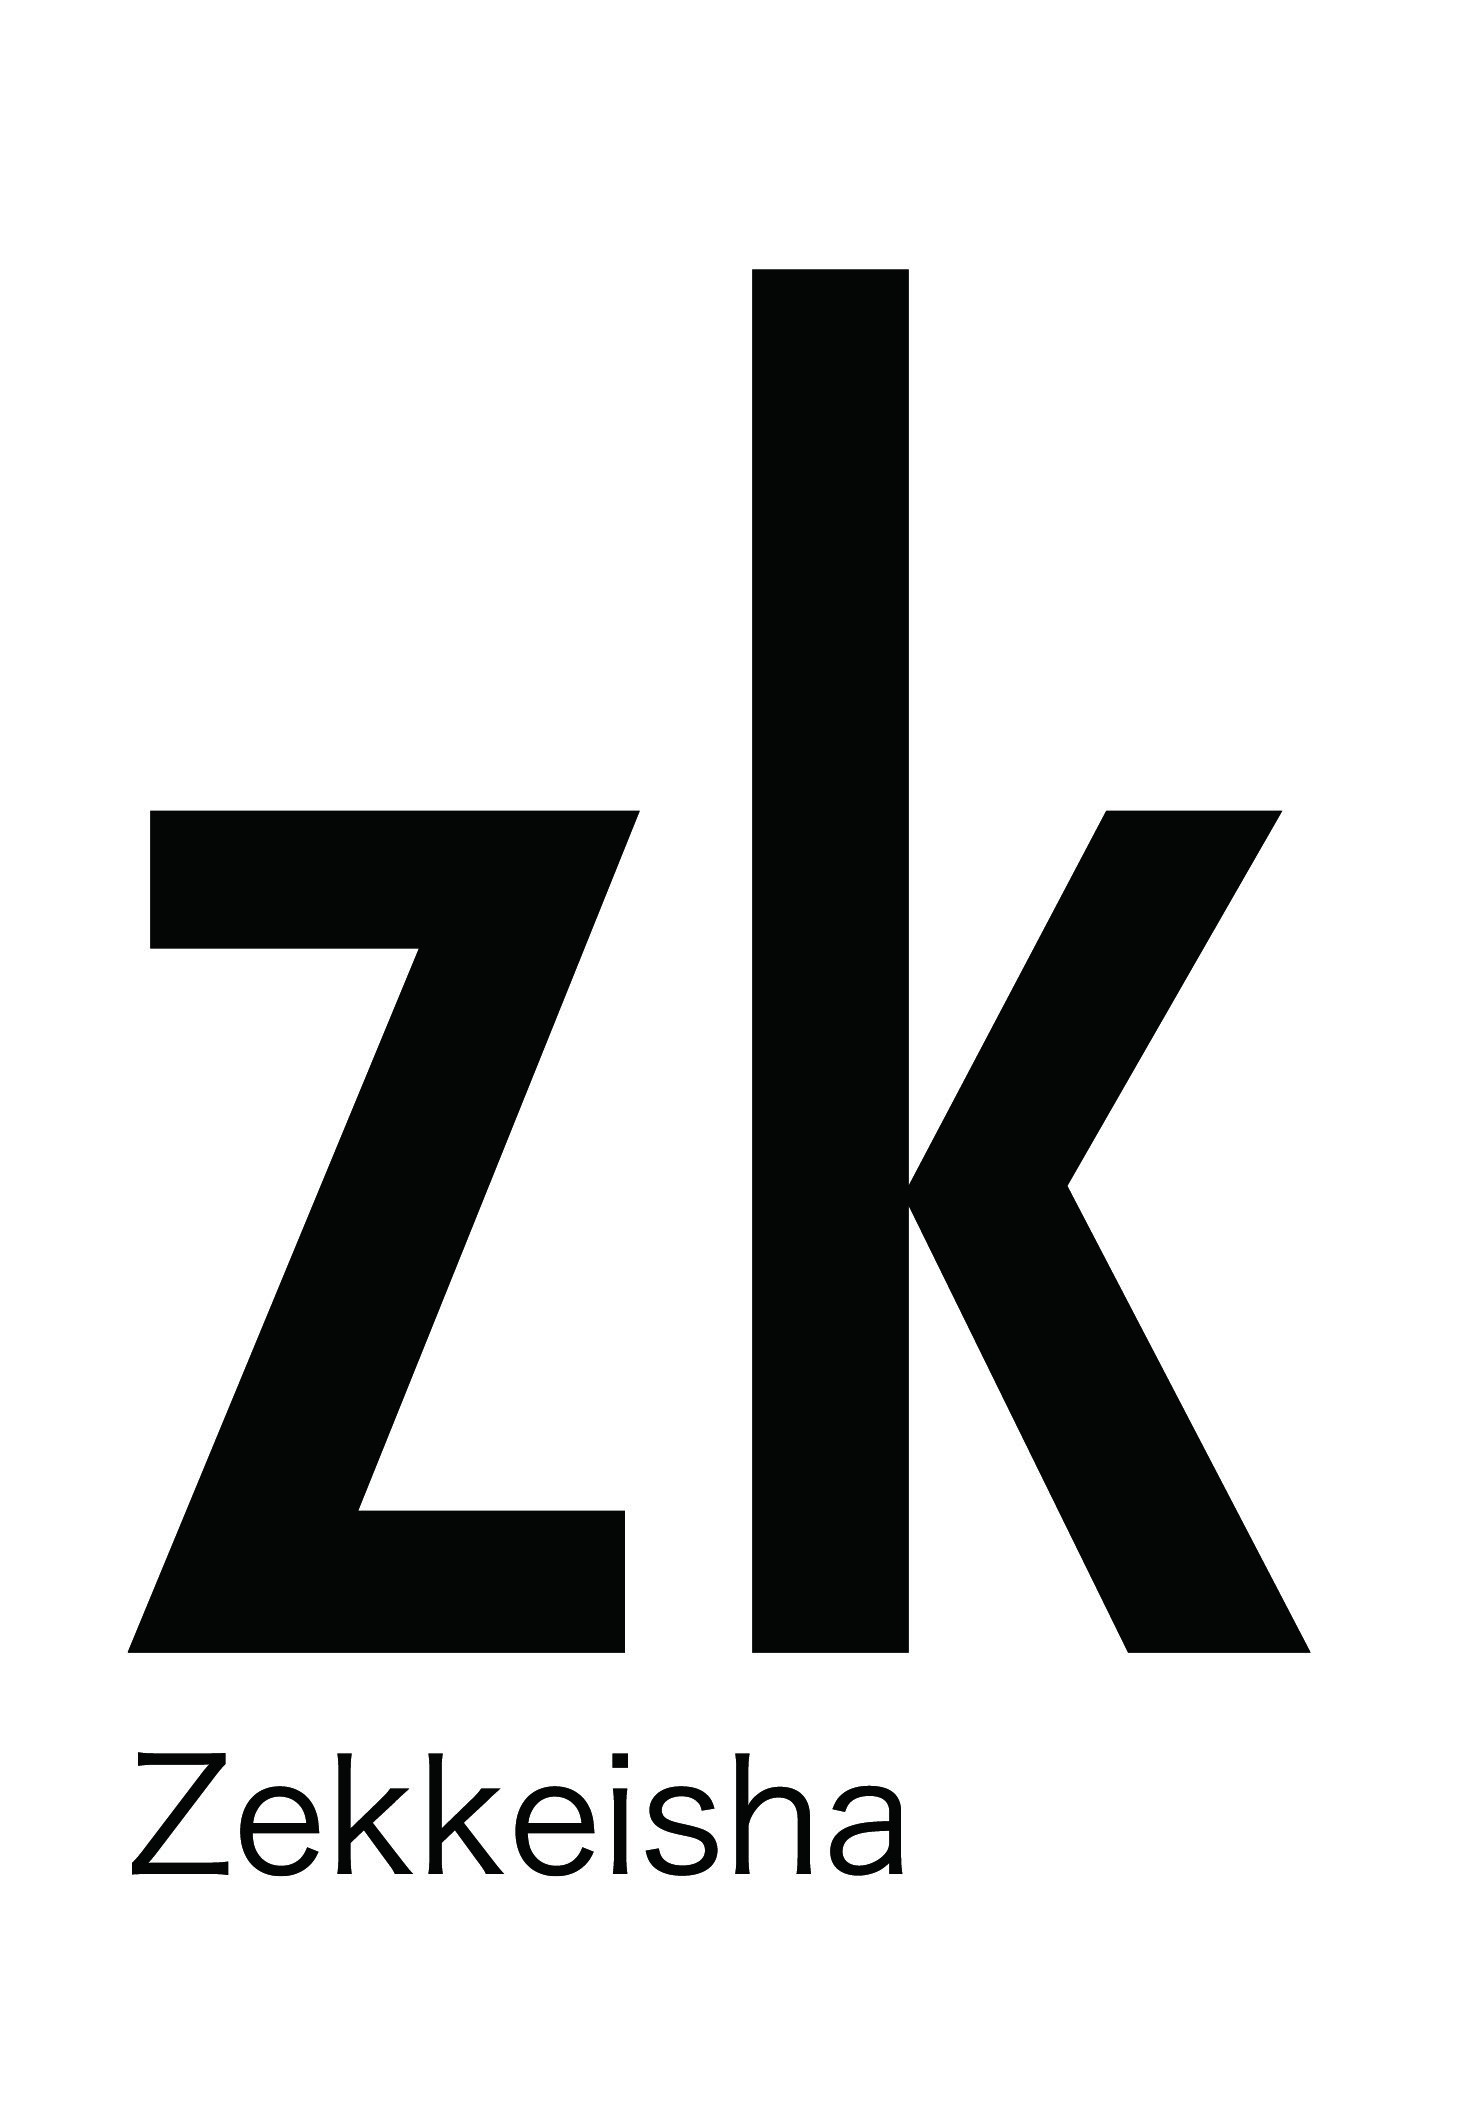 絶景社 Zekkeisha